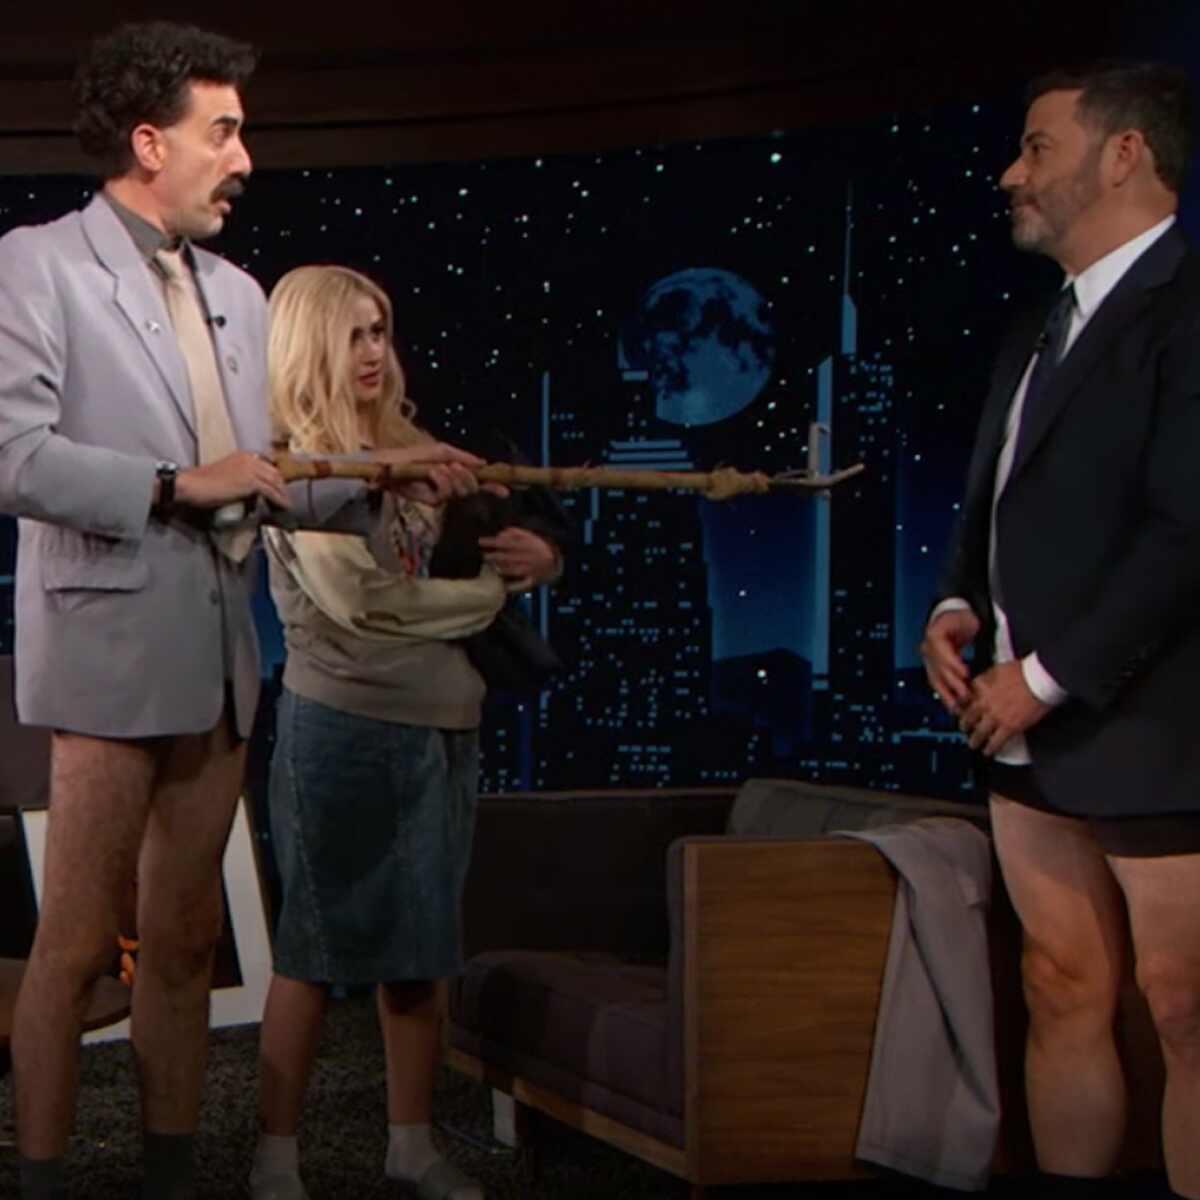 Jimmy Kimmel, Borat, Sacha Baron Cohen